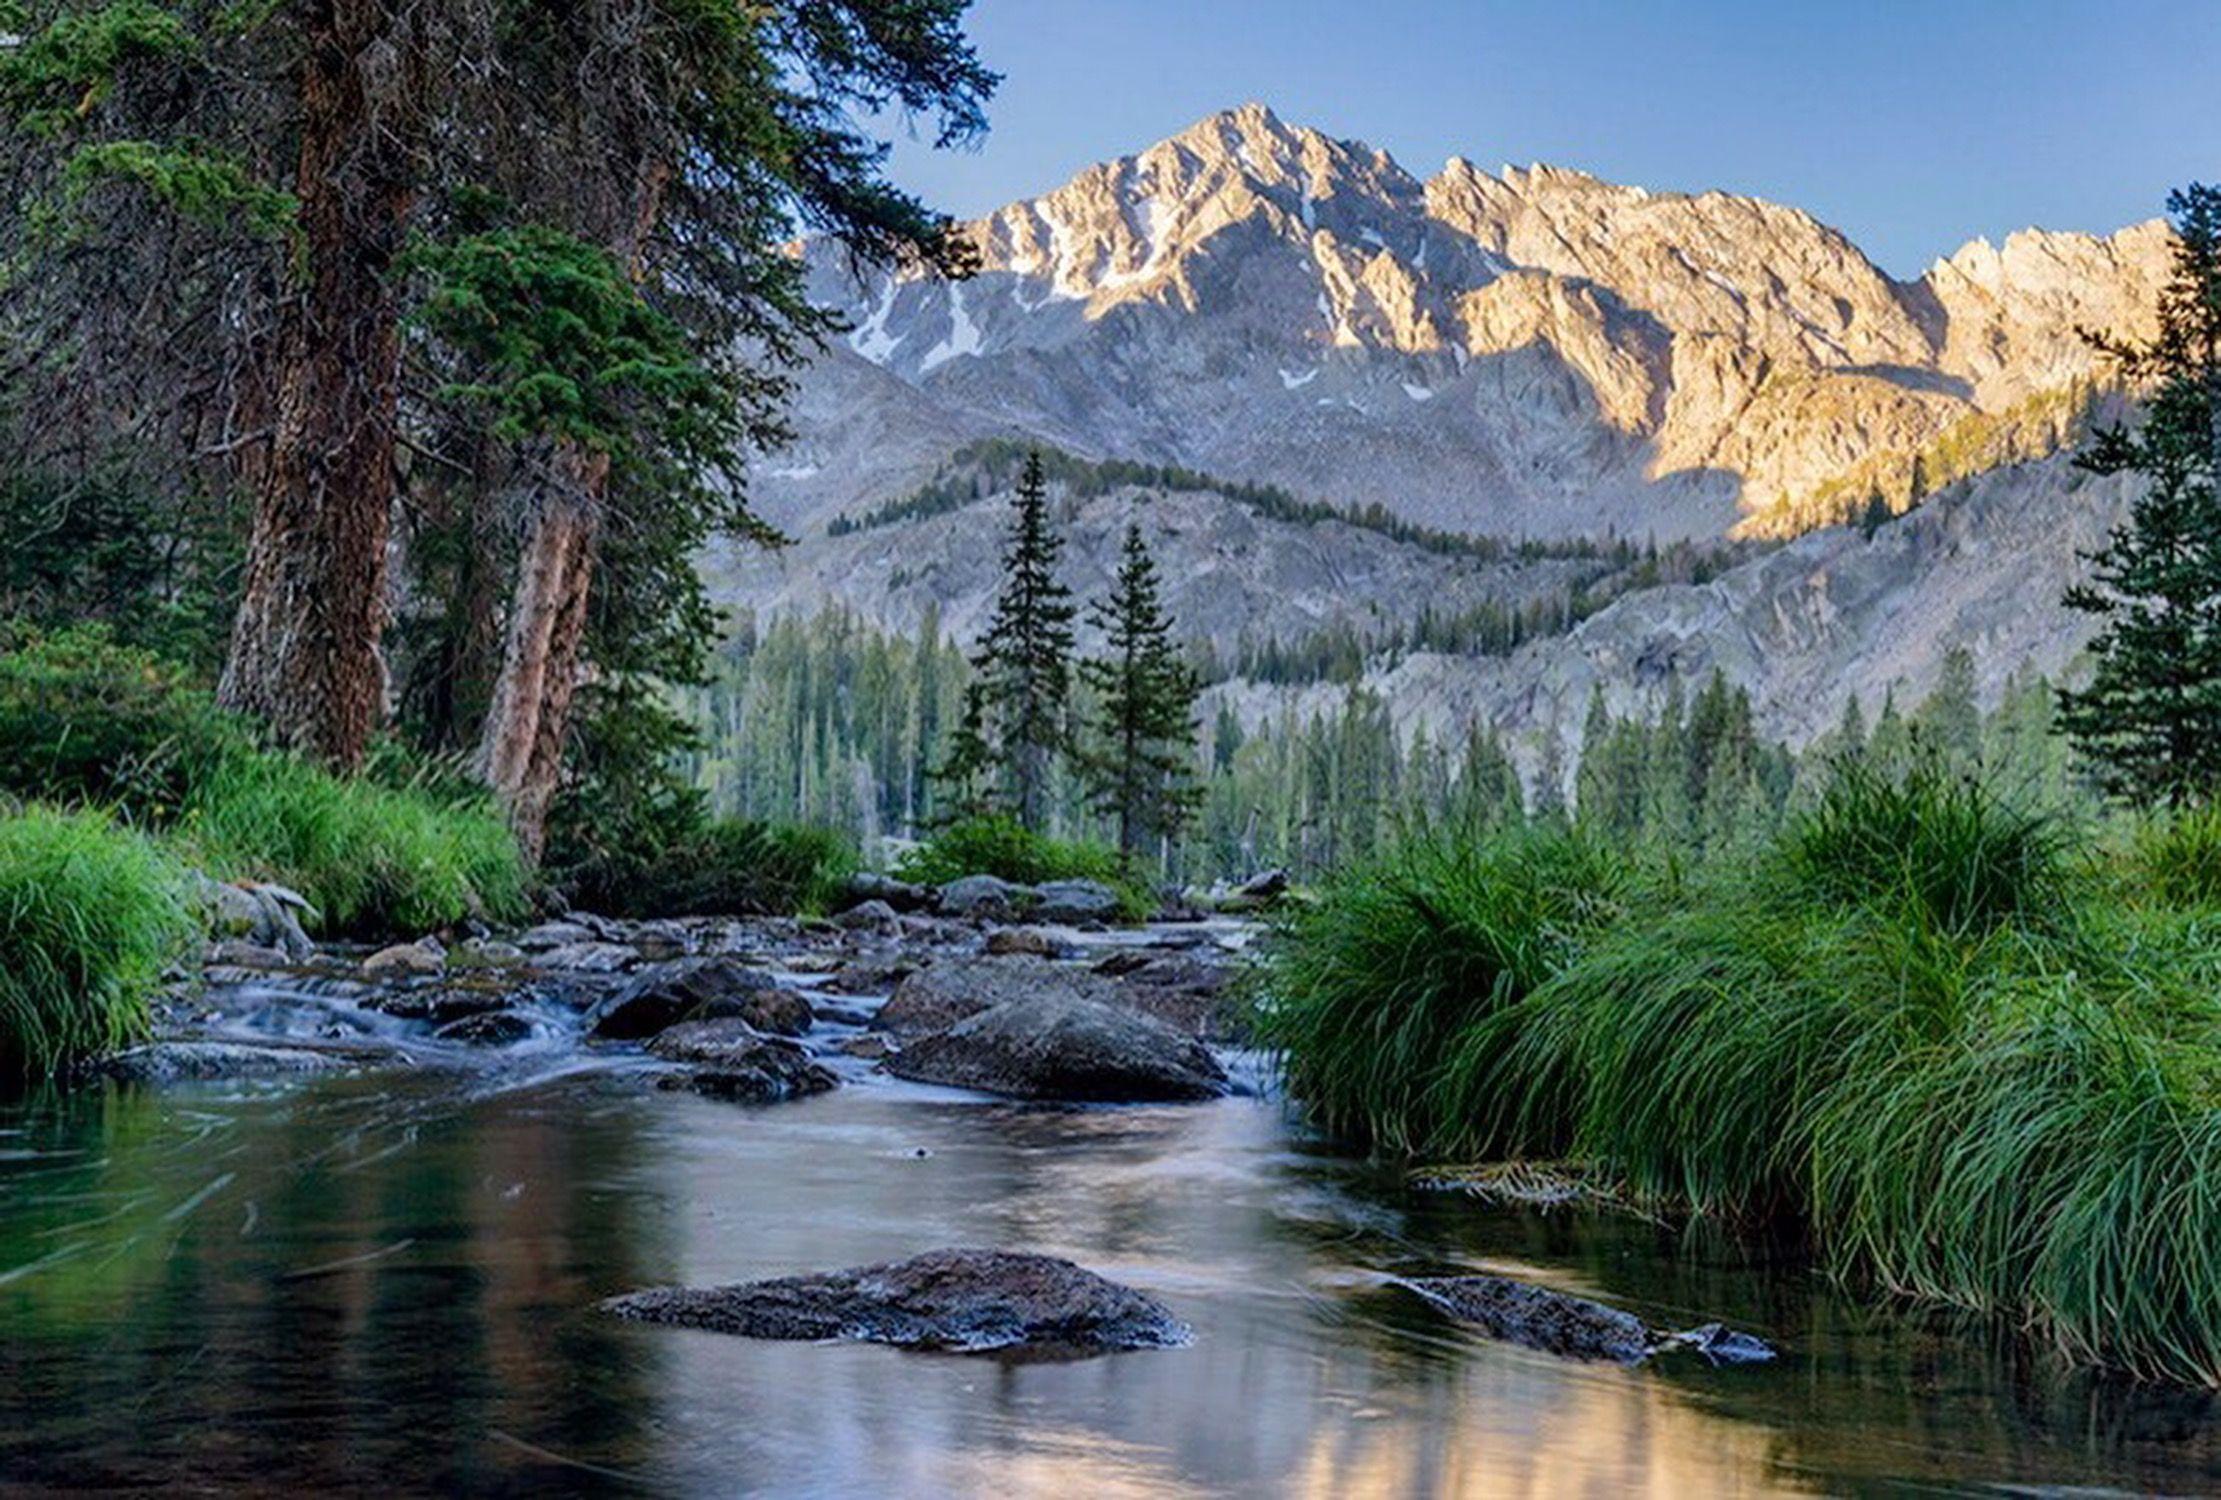 Sunrise at beautiful Moose Lake in Idaho's Pioneer